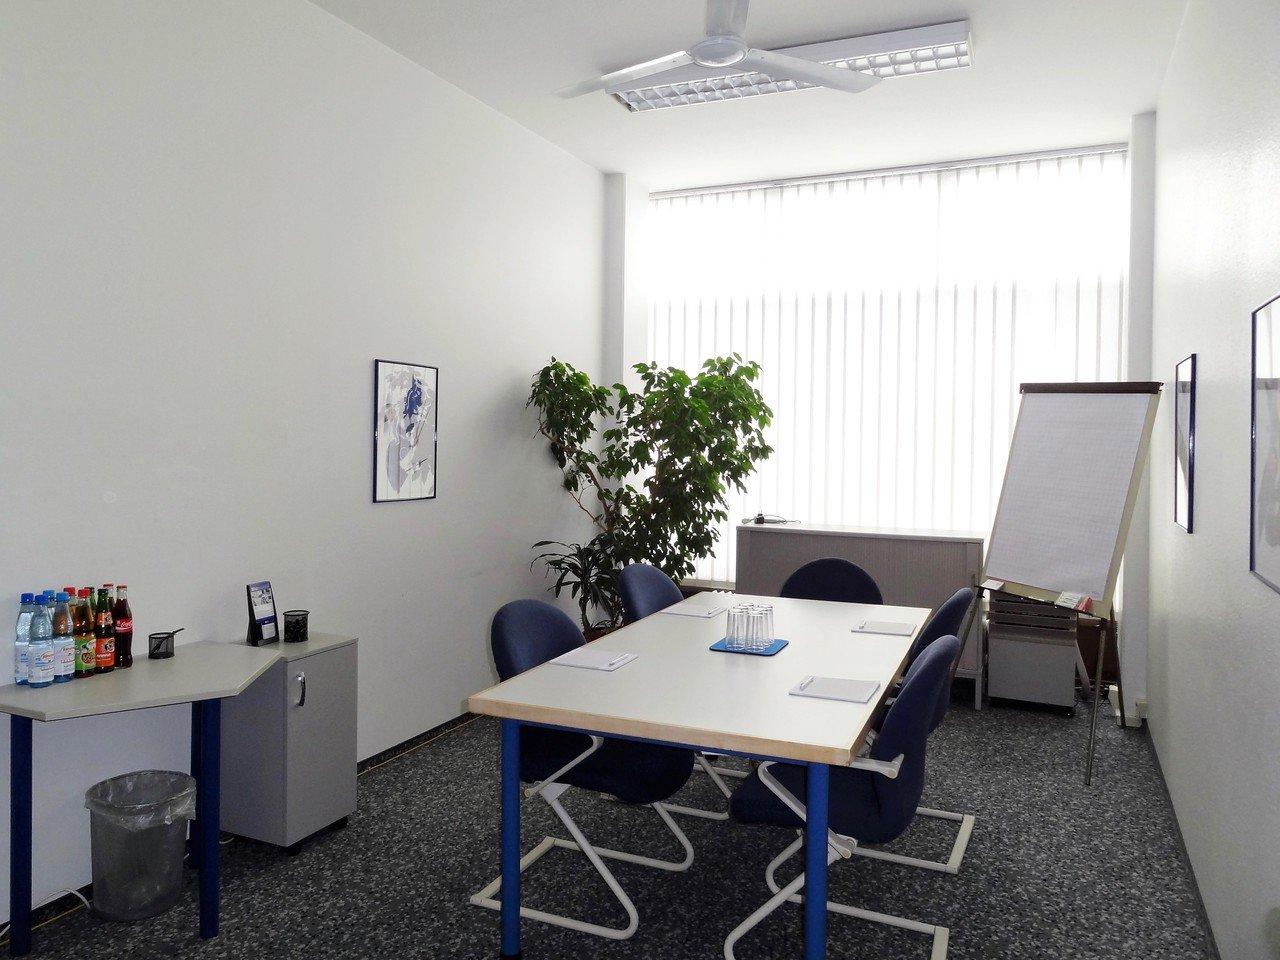 Nürnberg conference rooms Meetingraum hib Coworking Projektraum image 0